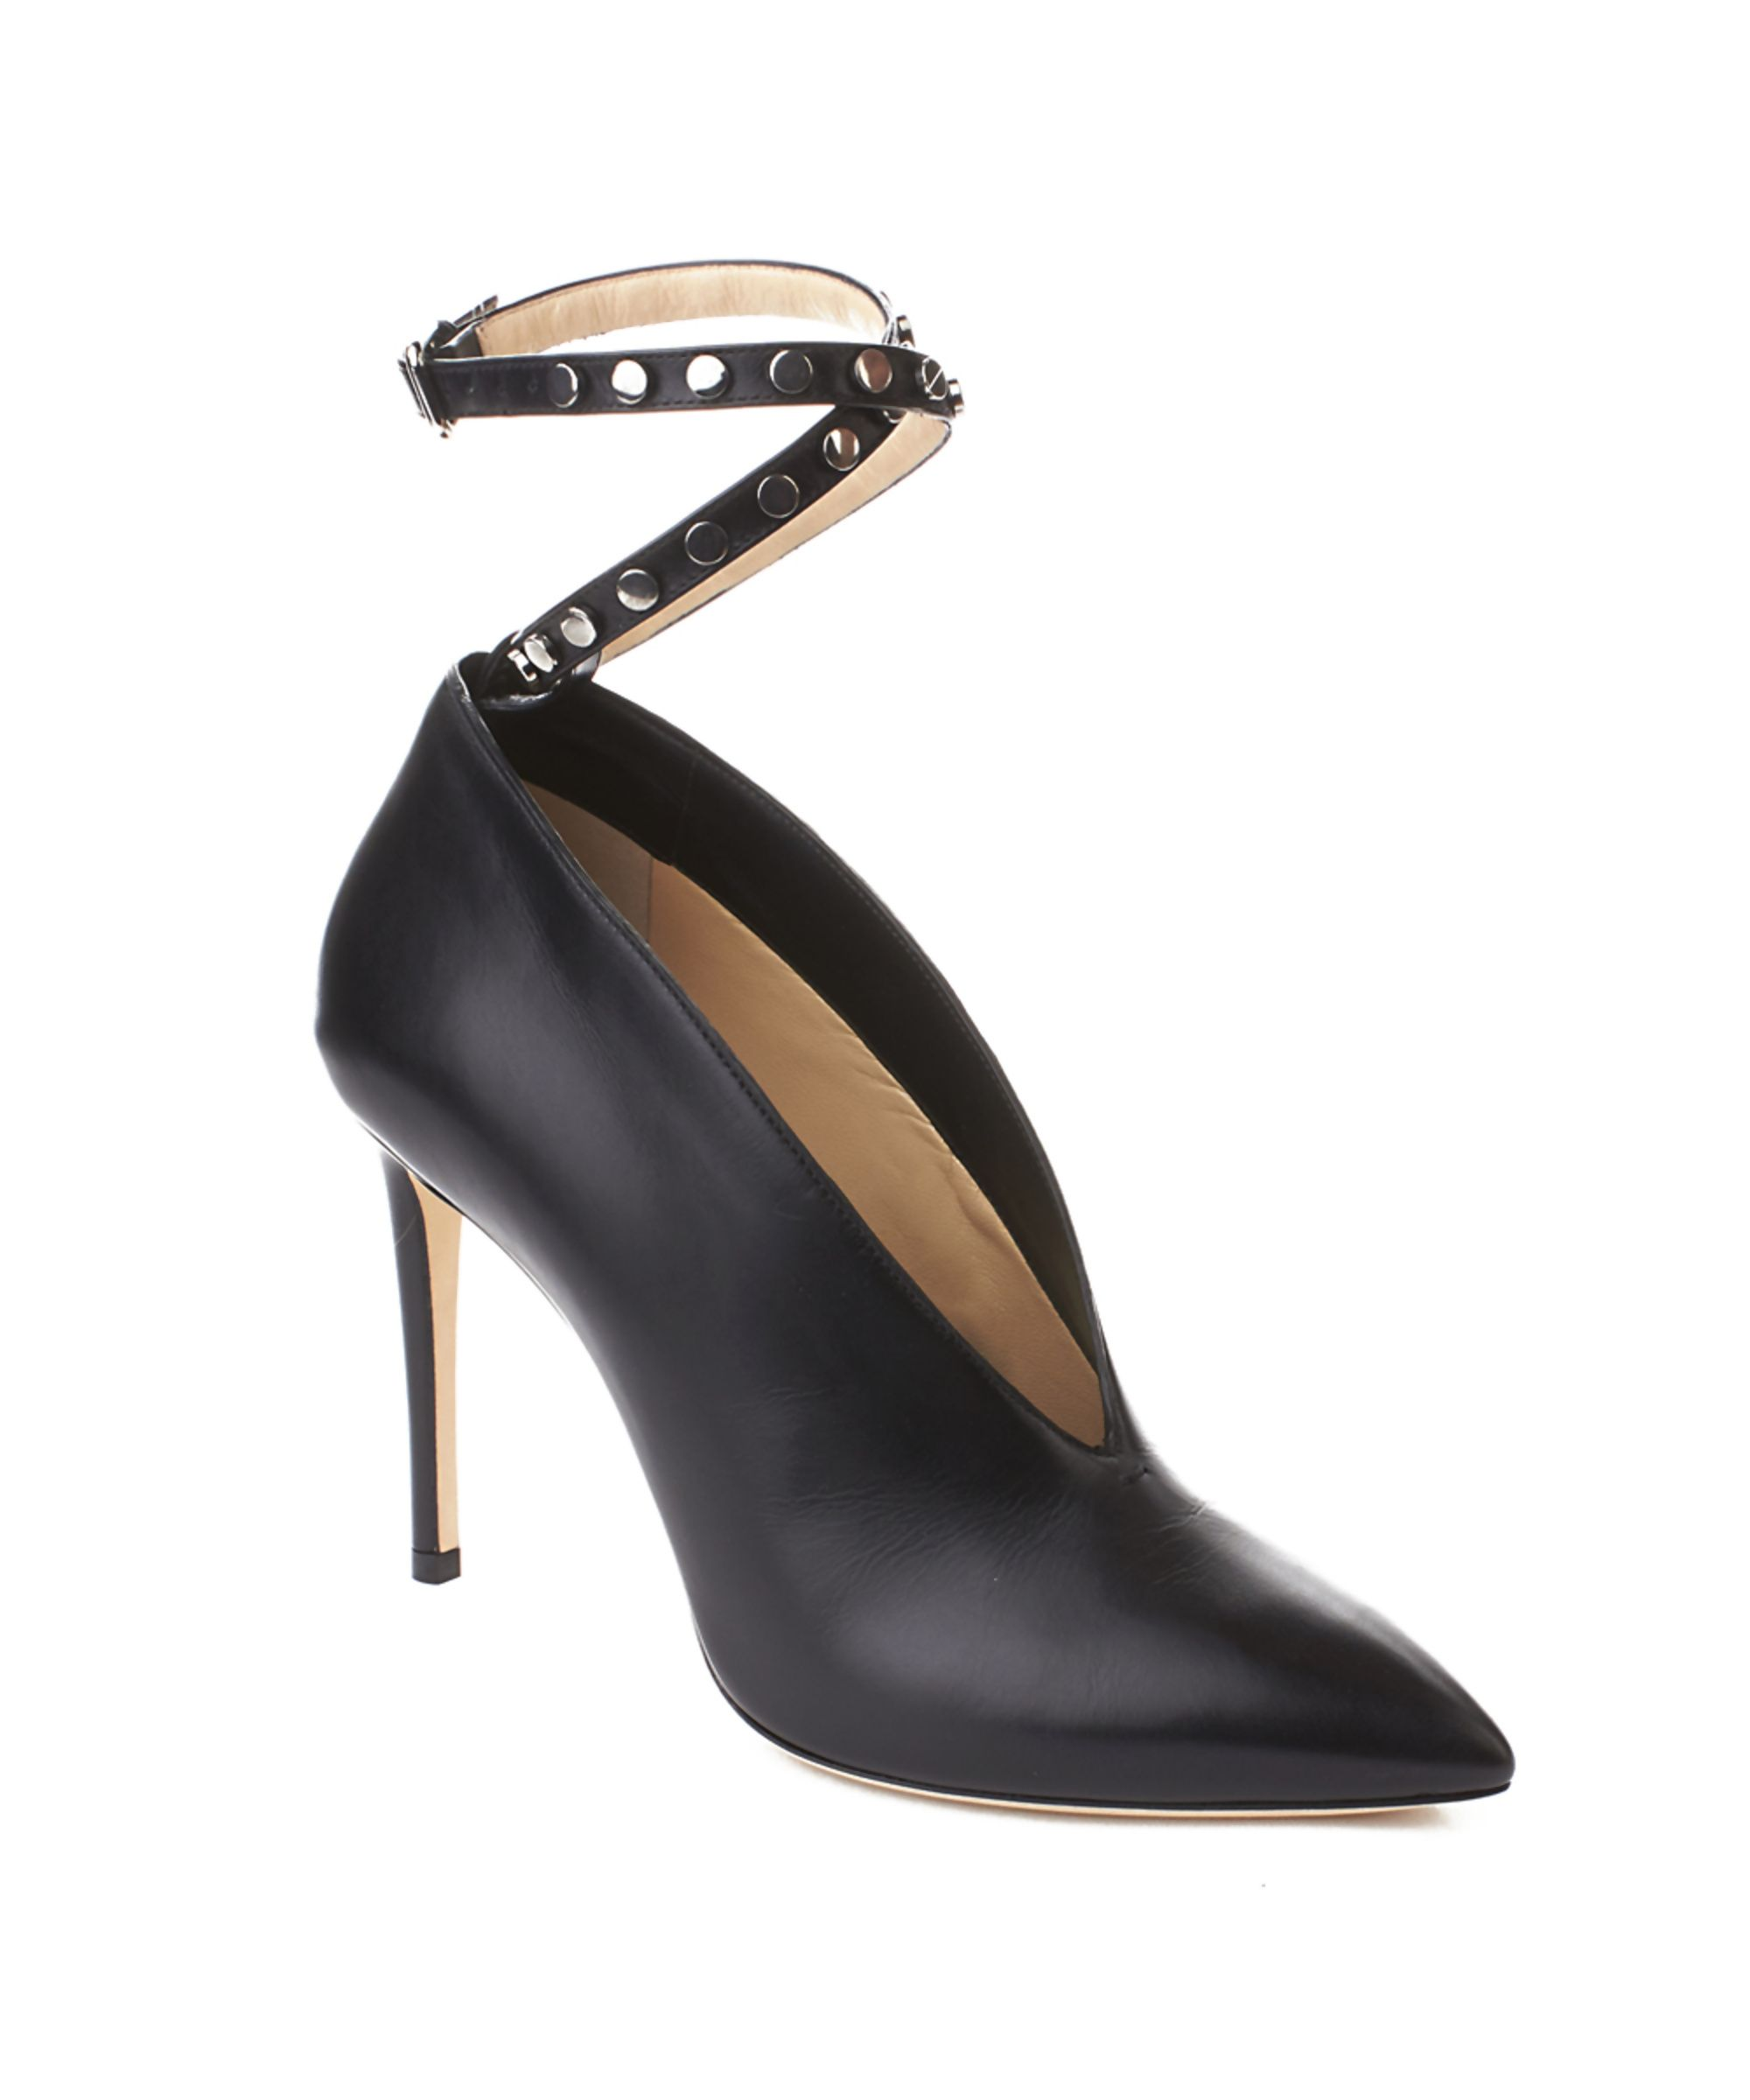 a82015d025 JIMMY CHOO   Jimmy Choo Women's 'lark 100' Leather Ankle Strapped High Heel  Pump Shoes Black #Shoes #Pumps & High Heels #JIMMY CHOO